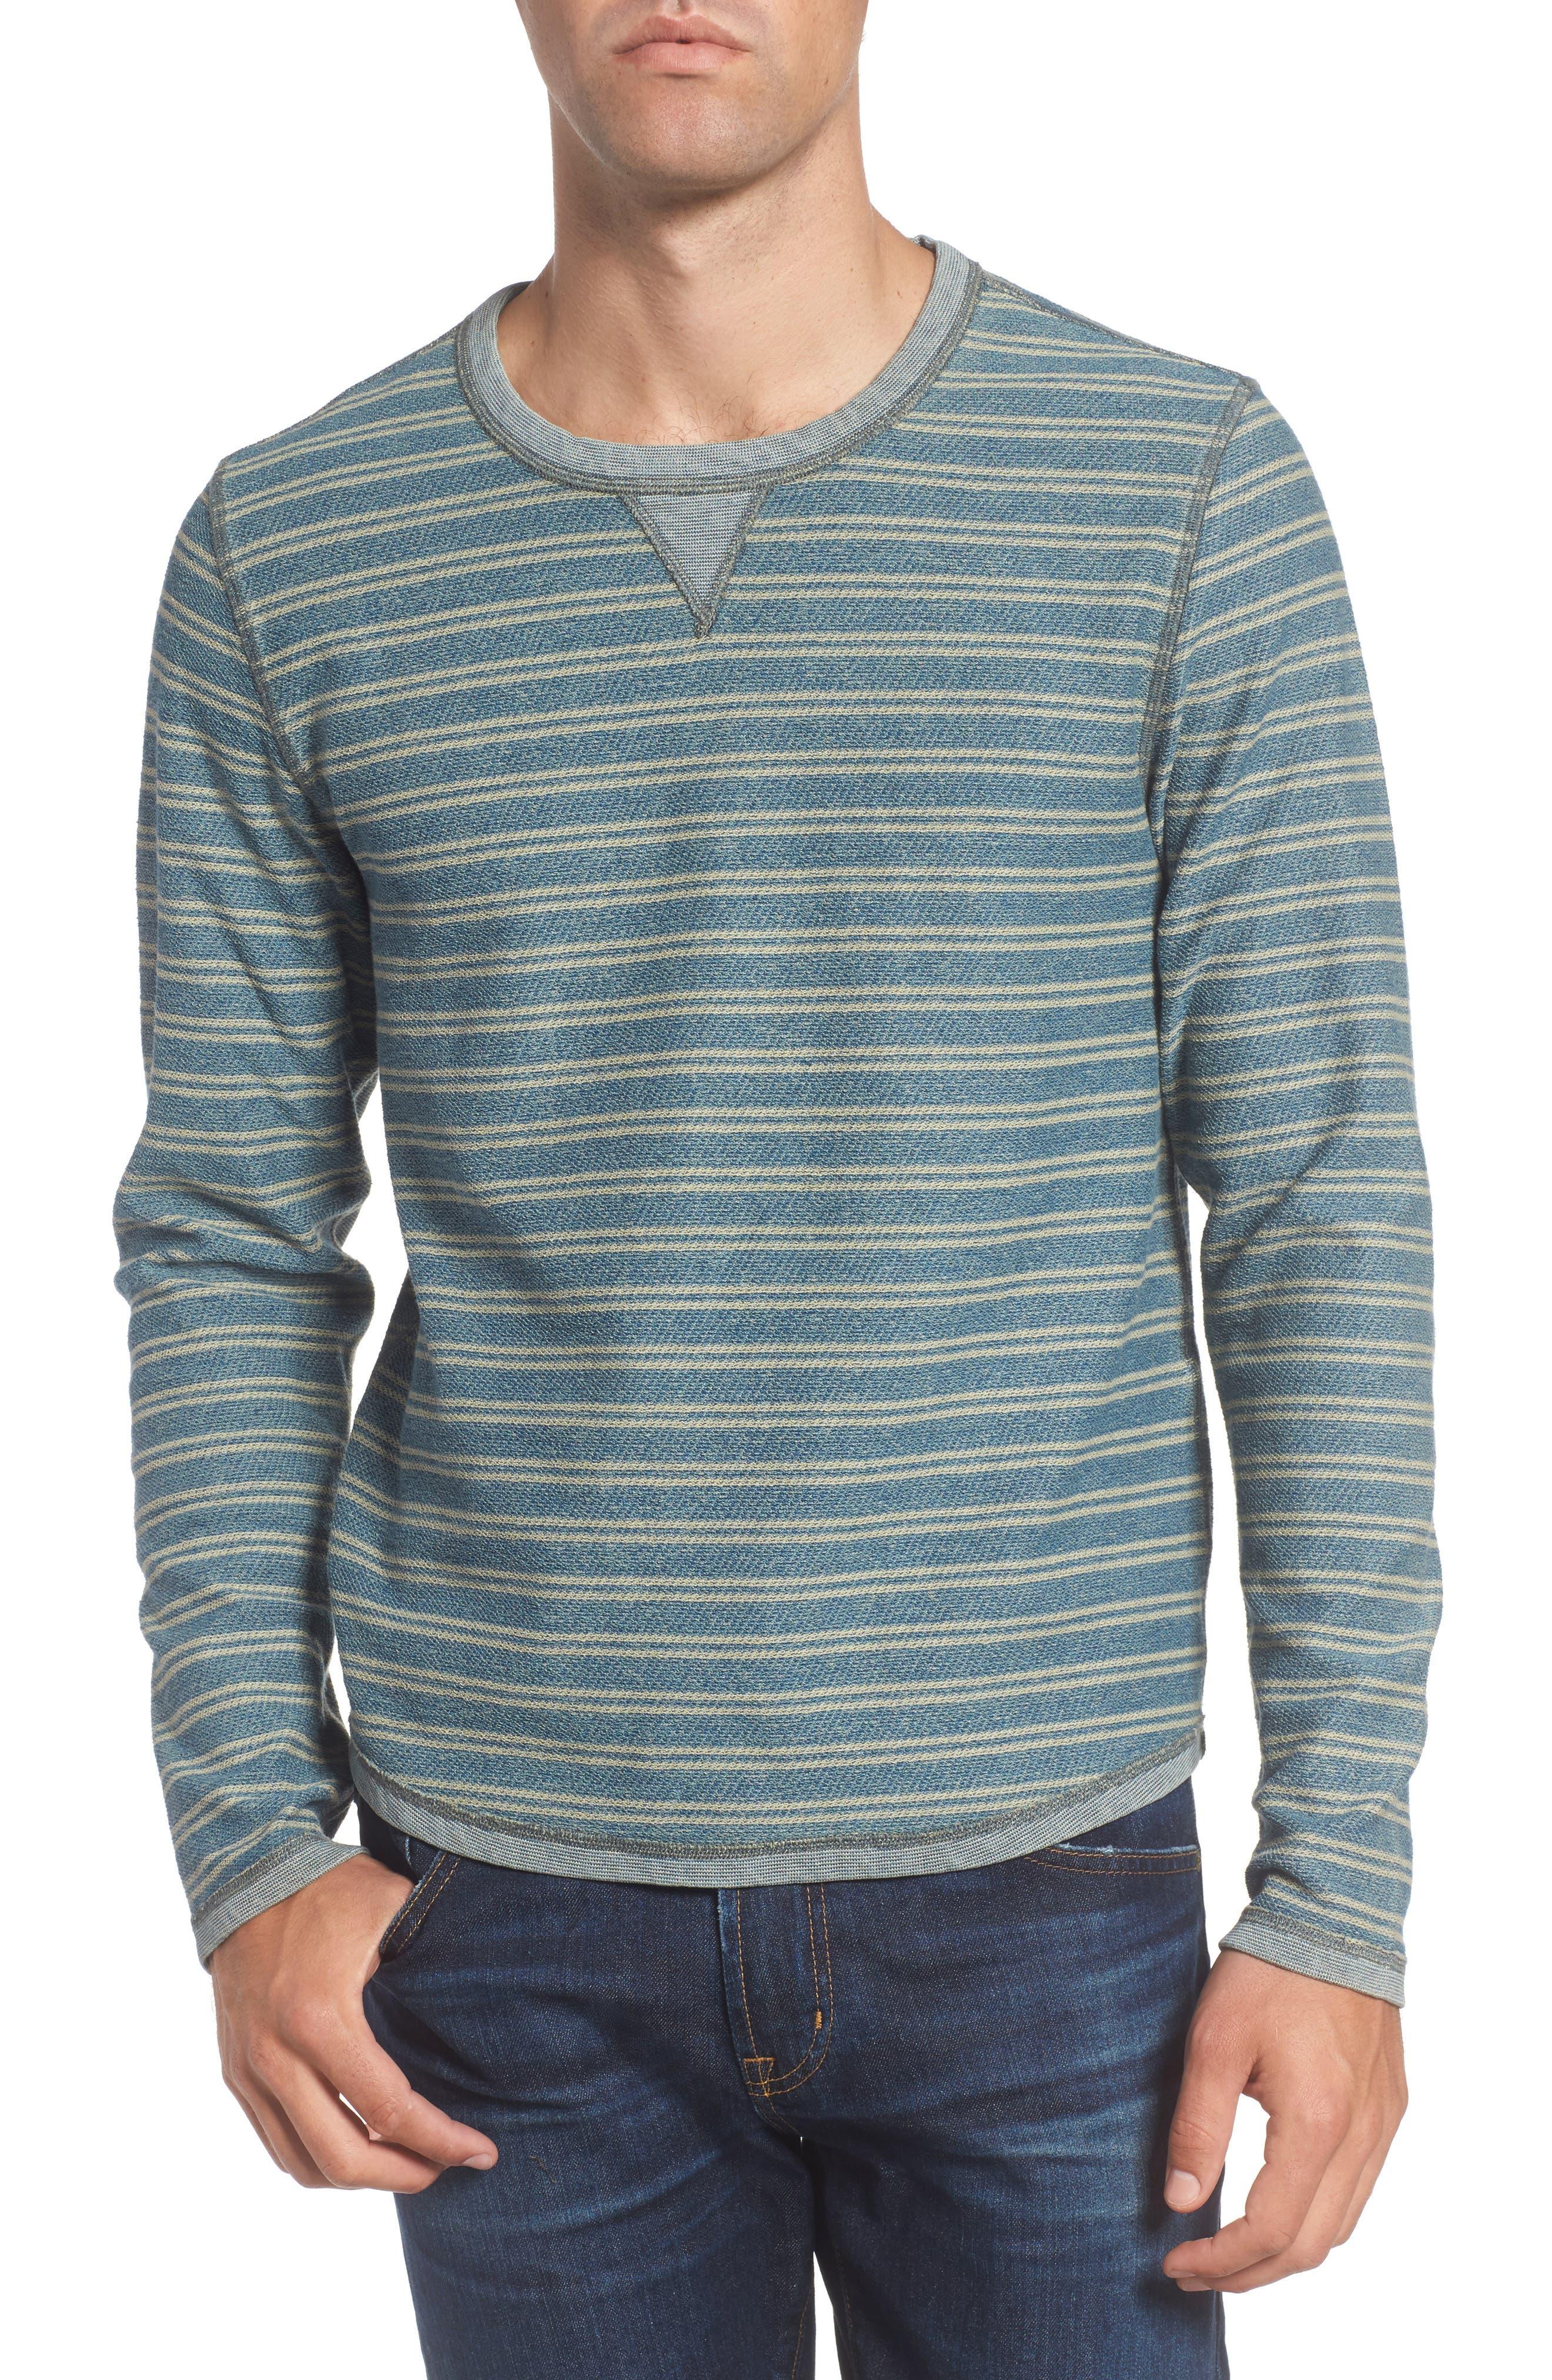 Jeremiah Strickland Reversible Crewneck Sweatshirt